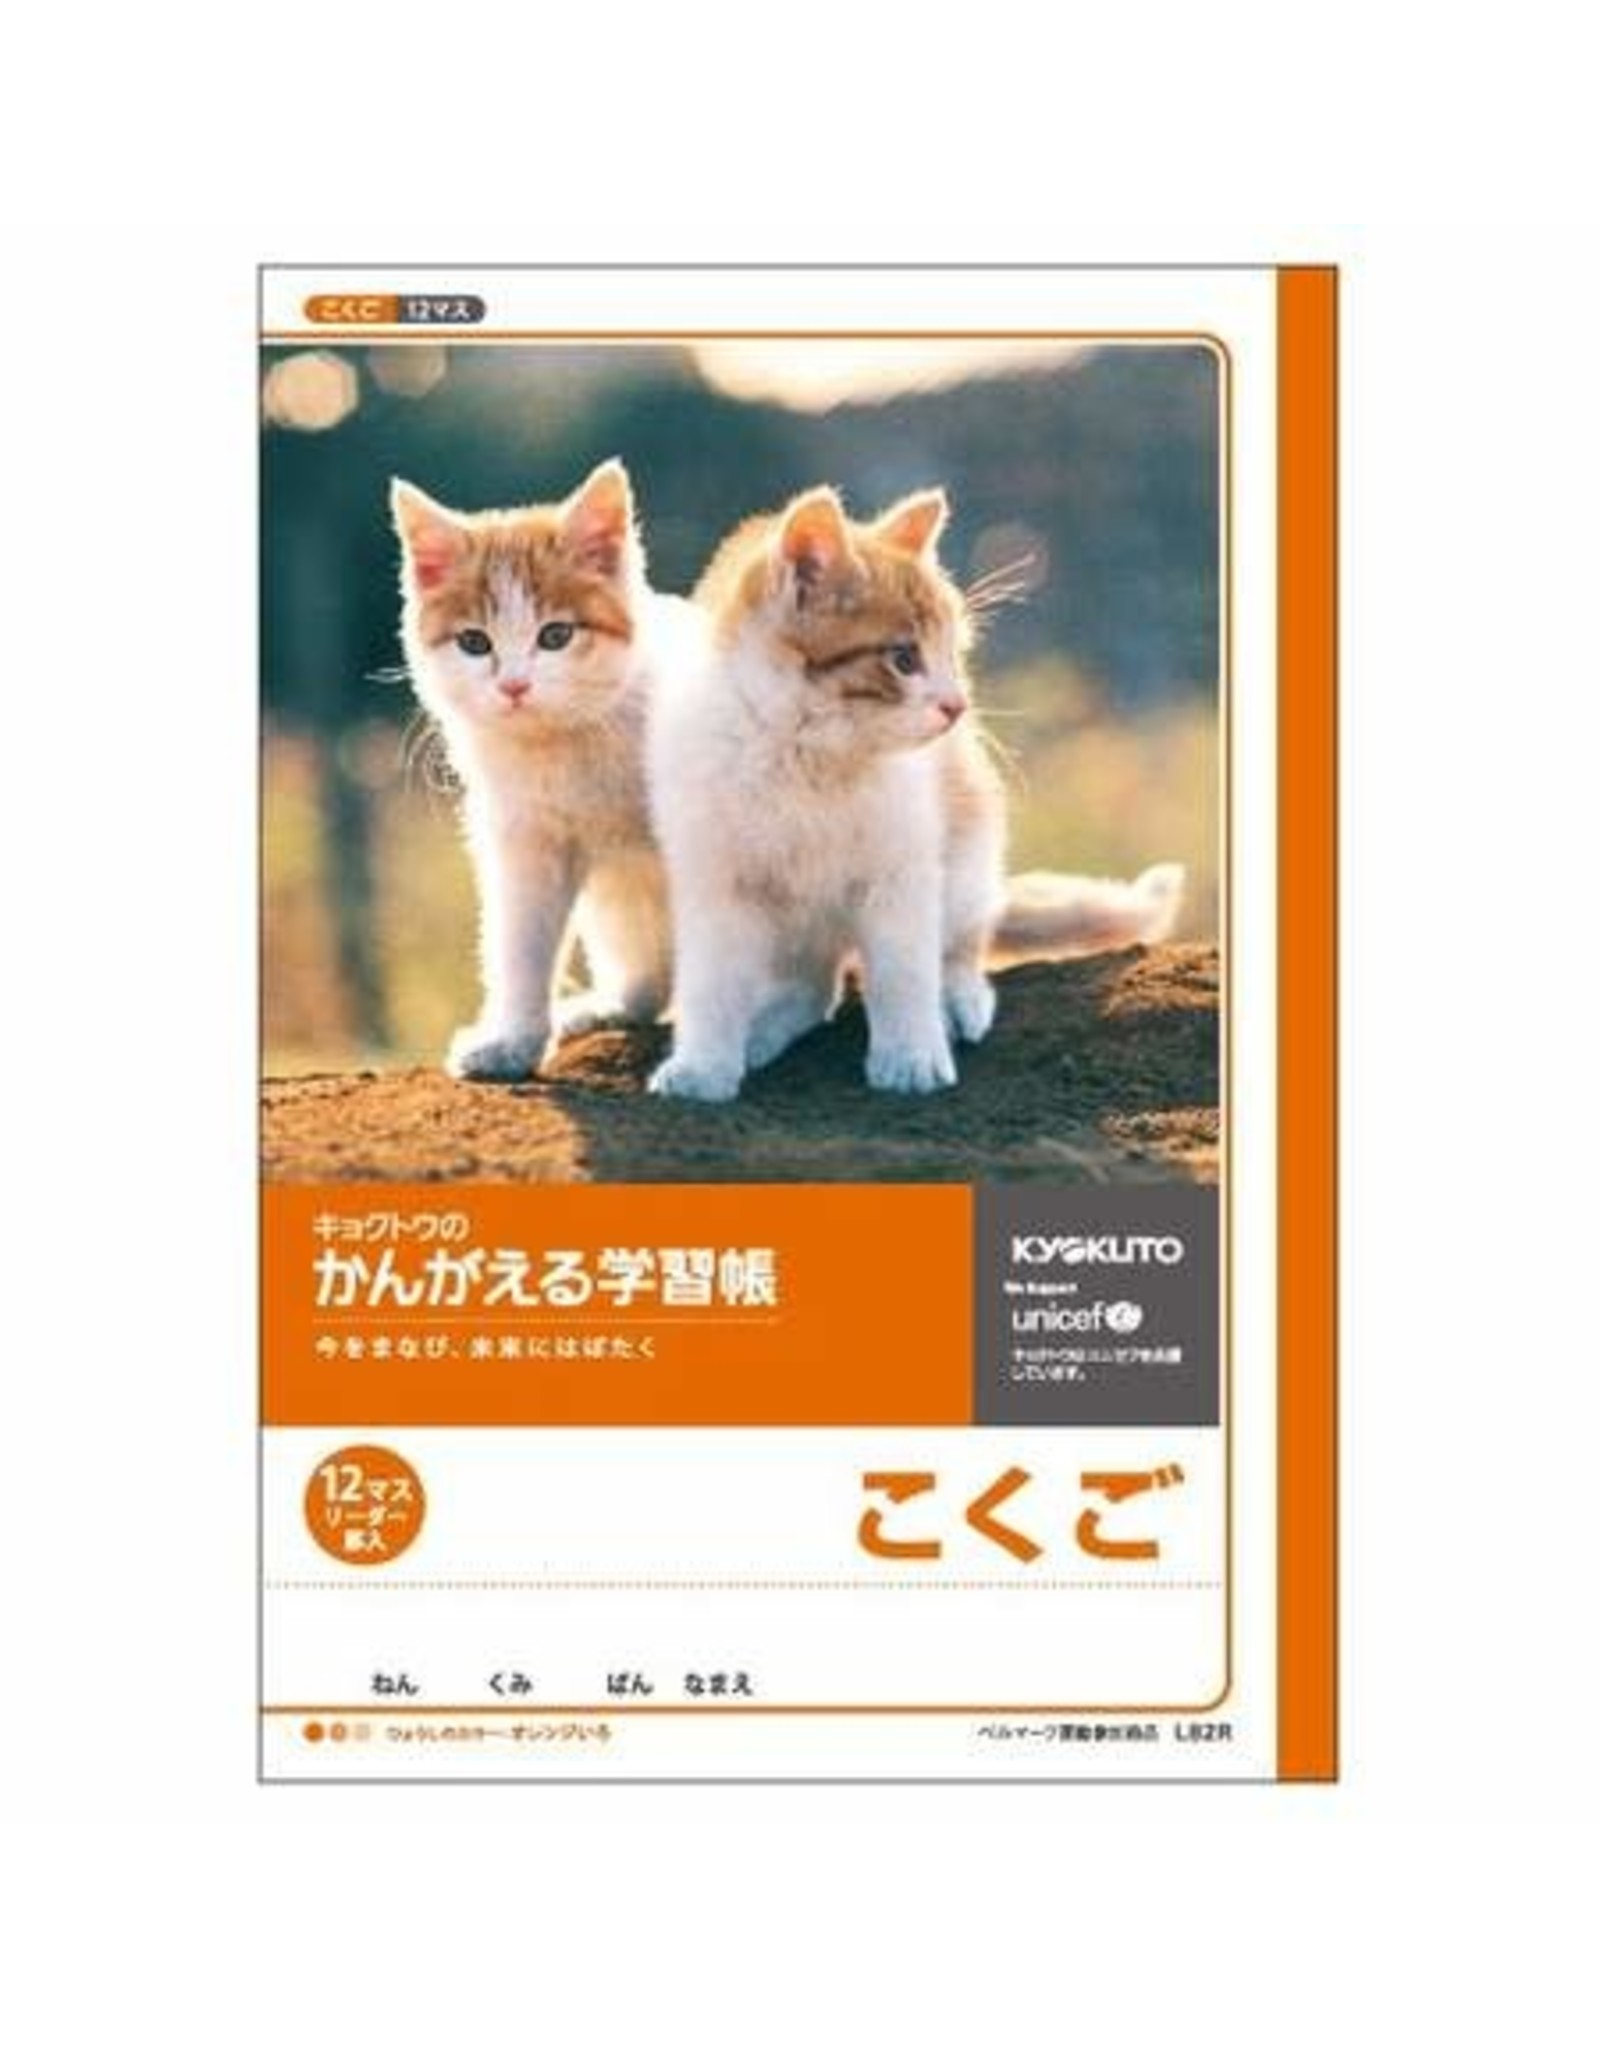 Kyokuto Associates co., ltd. STUDY NOTEBOOK KOKUGO 12 GRIDS